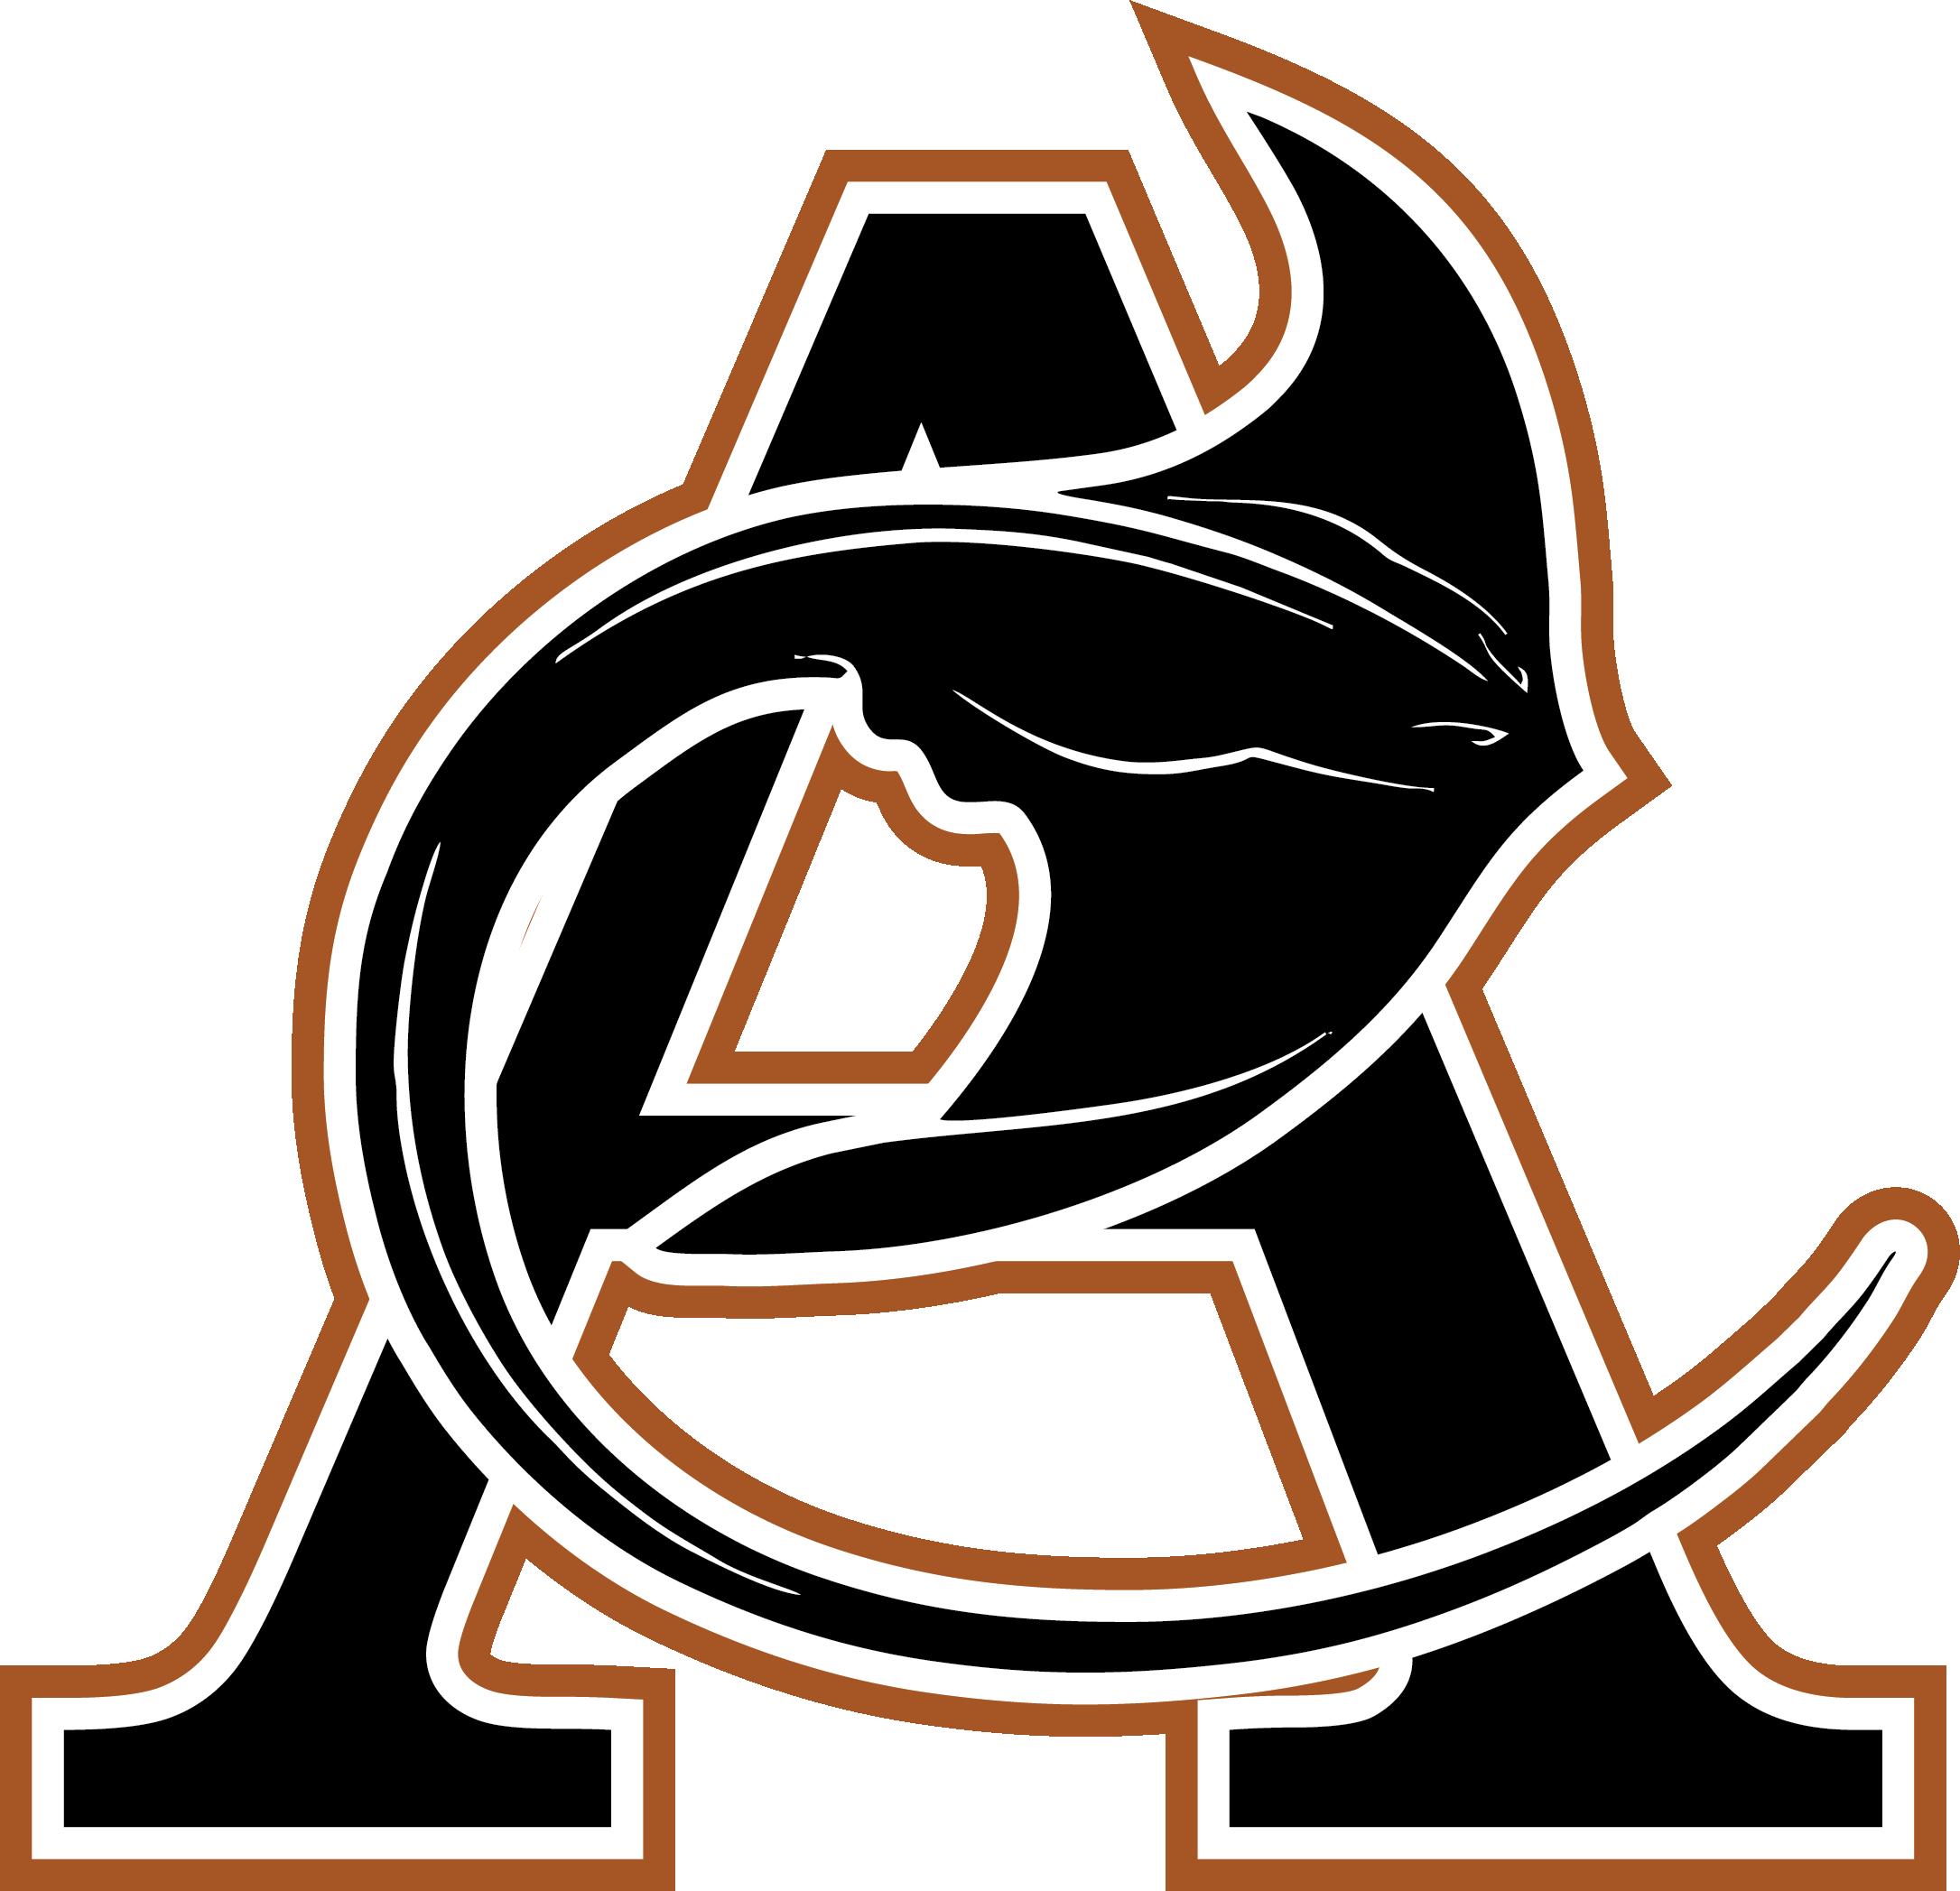 Atlantic high school clipart png black and white stock Atlantic Coast High School / Homepage png black and white stock